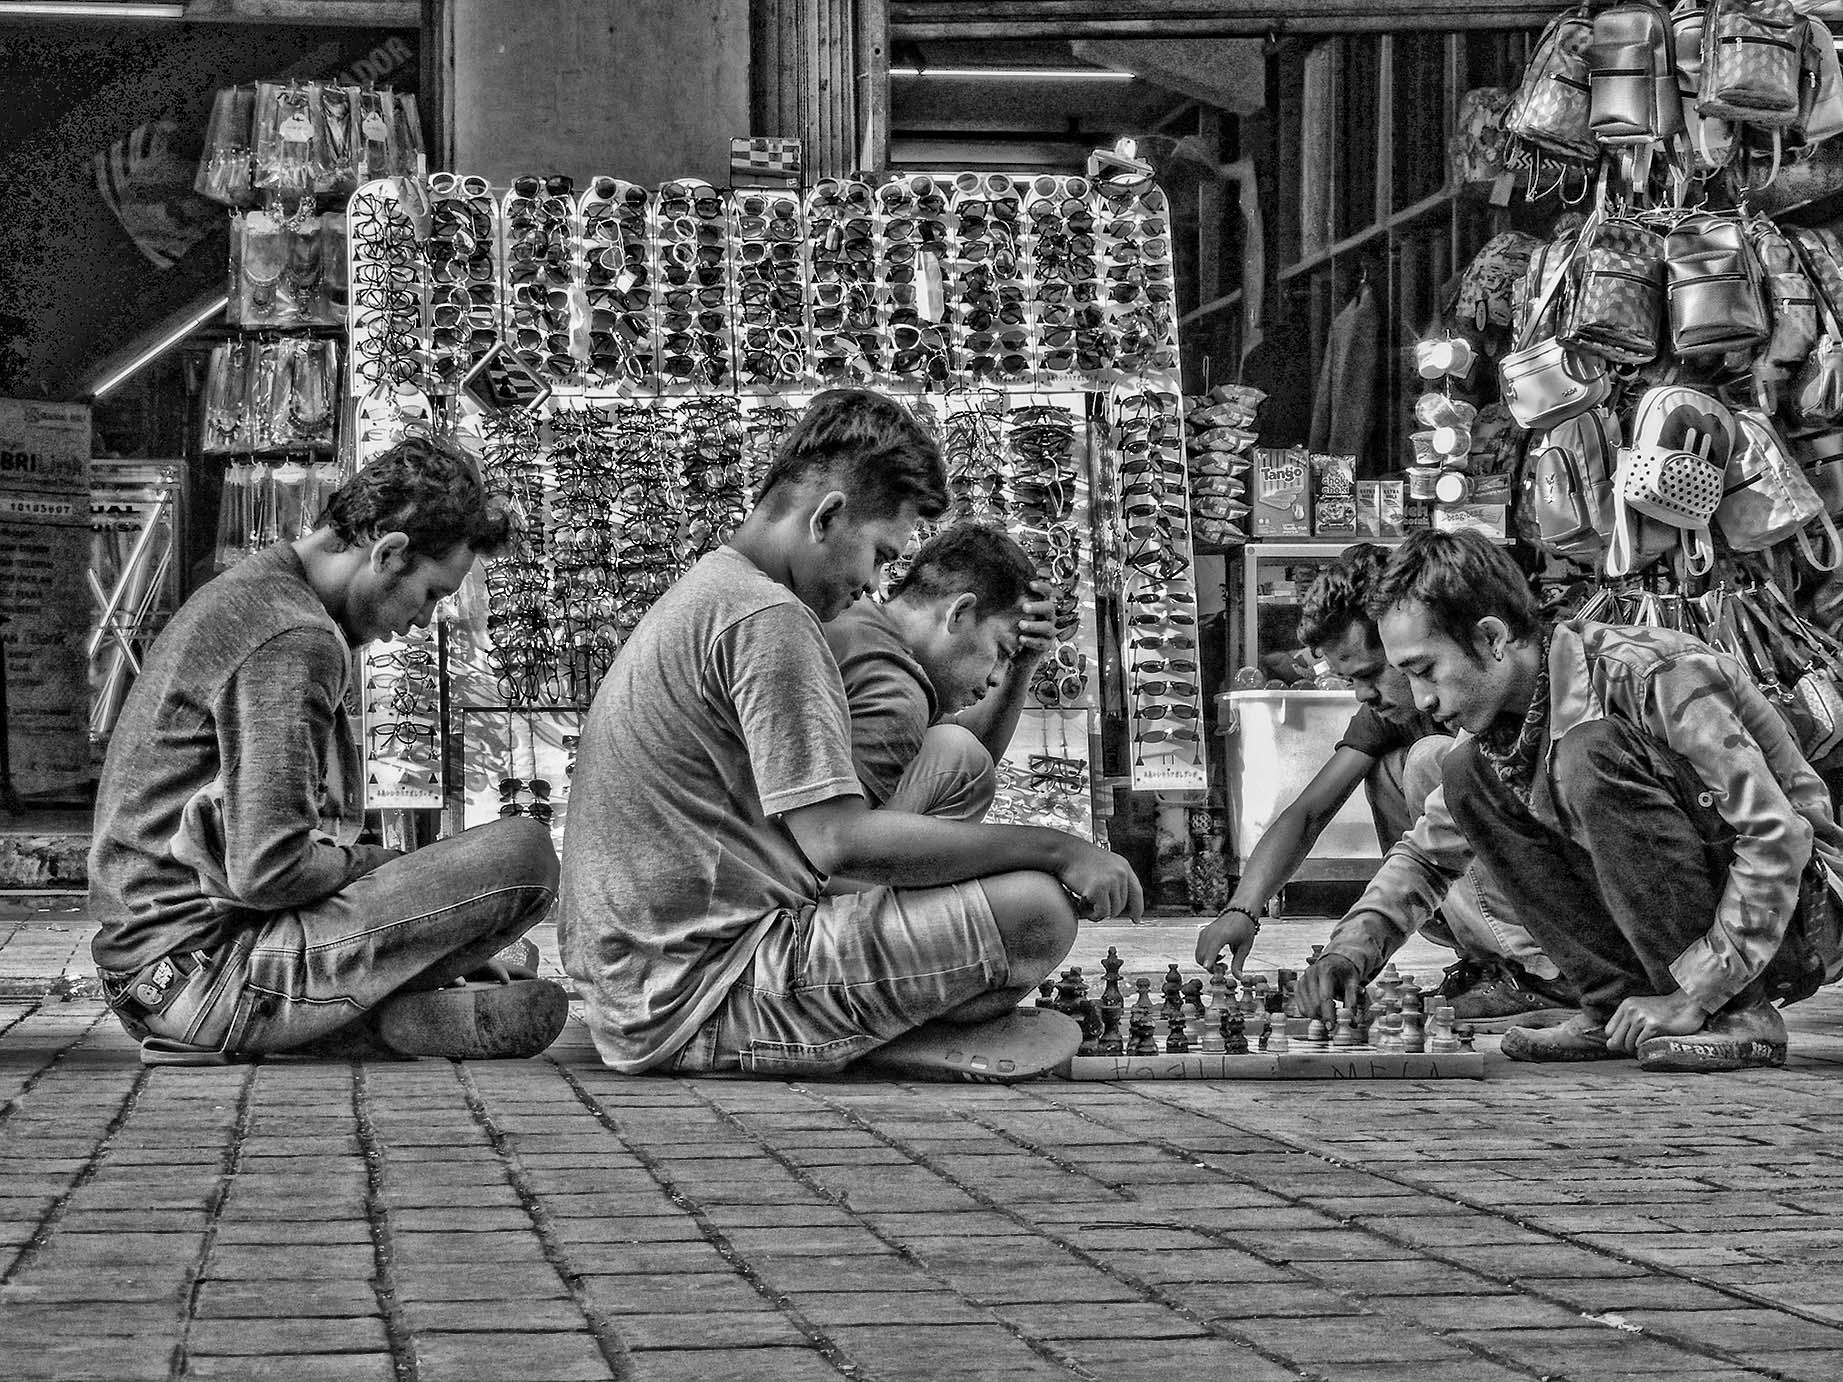 foto-foto street photography dari profesional